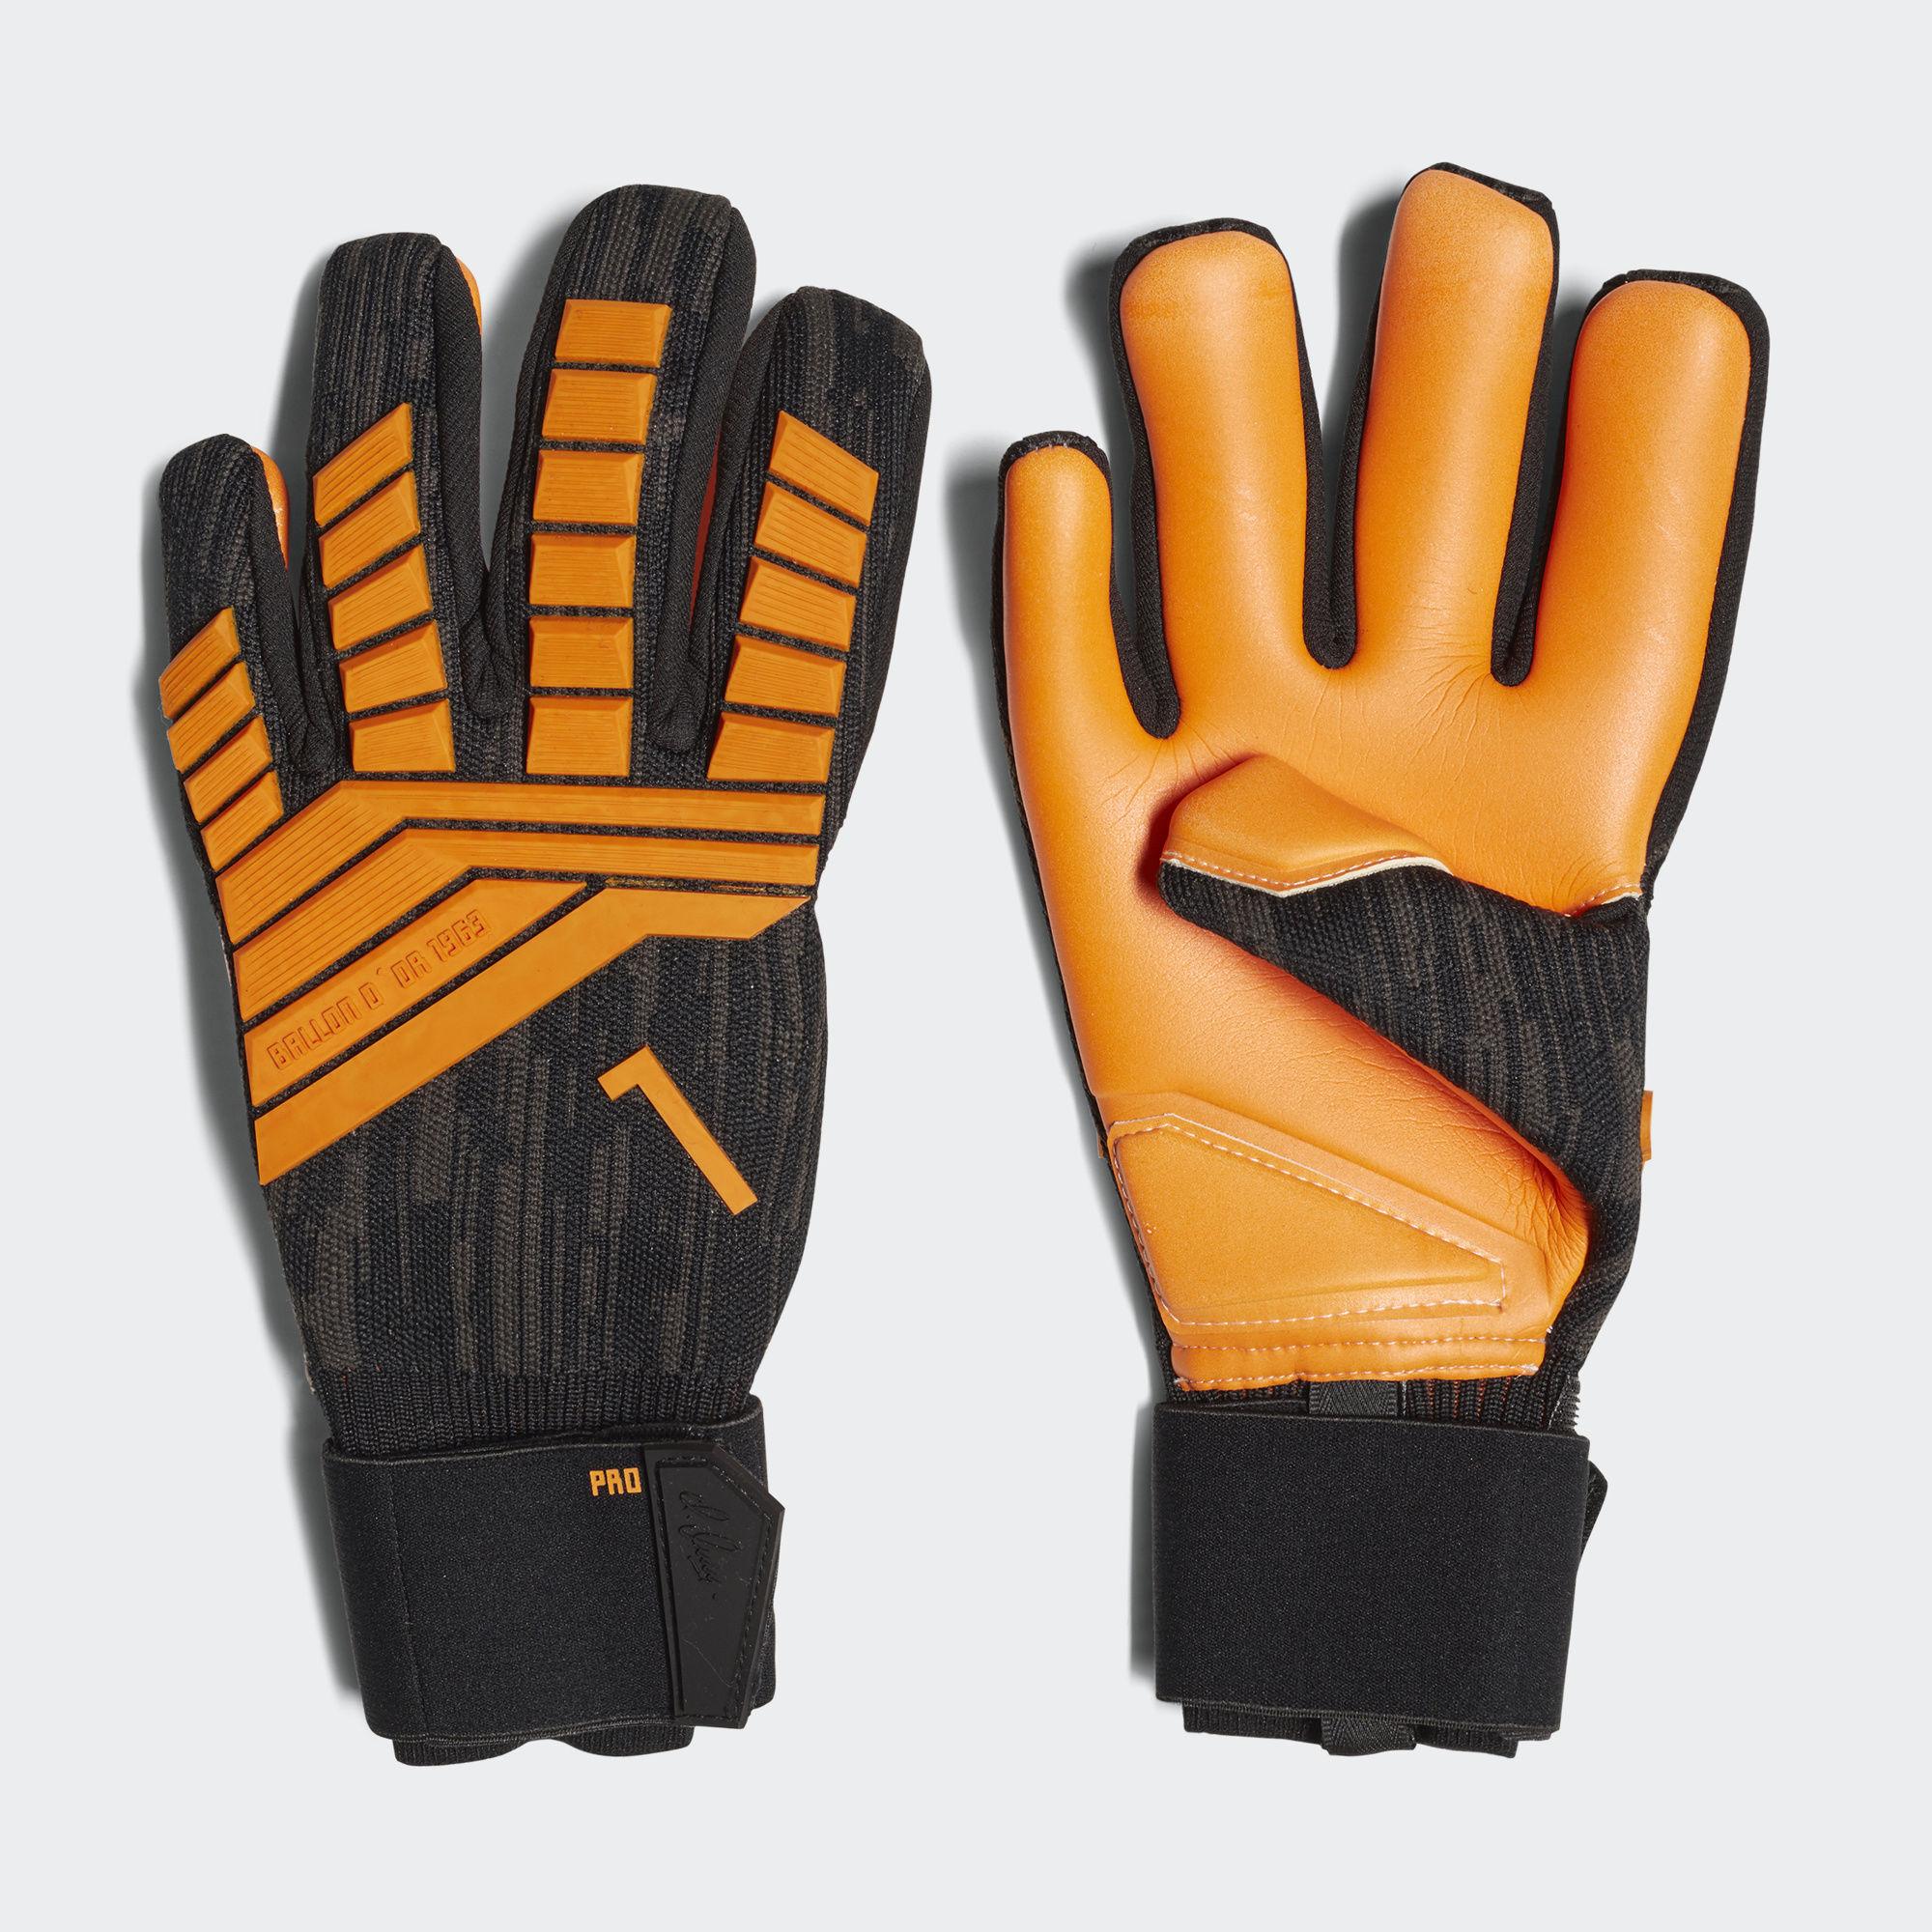 Вратарские перчатки Predator 18 Lev Jashin M CE4933 adidas Performance -  Украина  979020d87033b